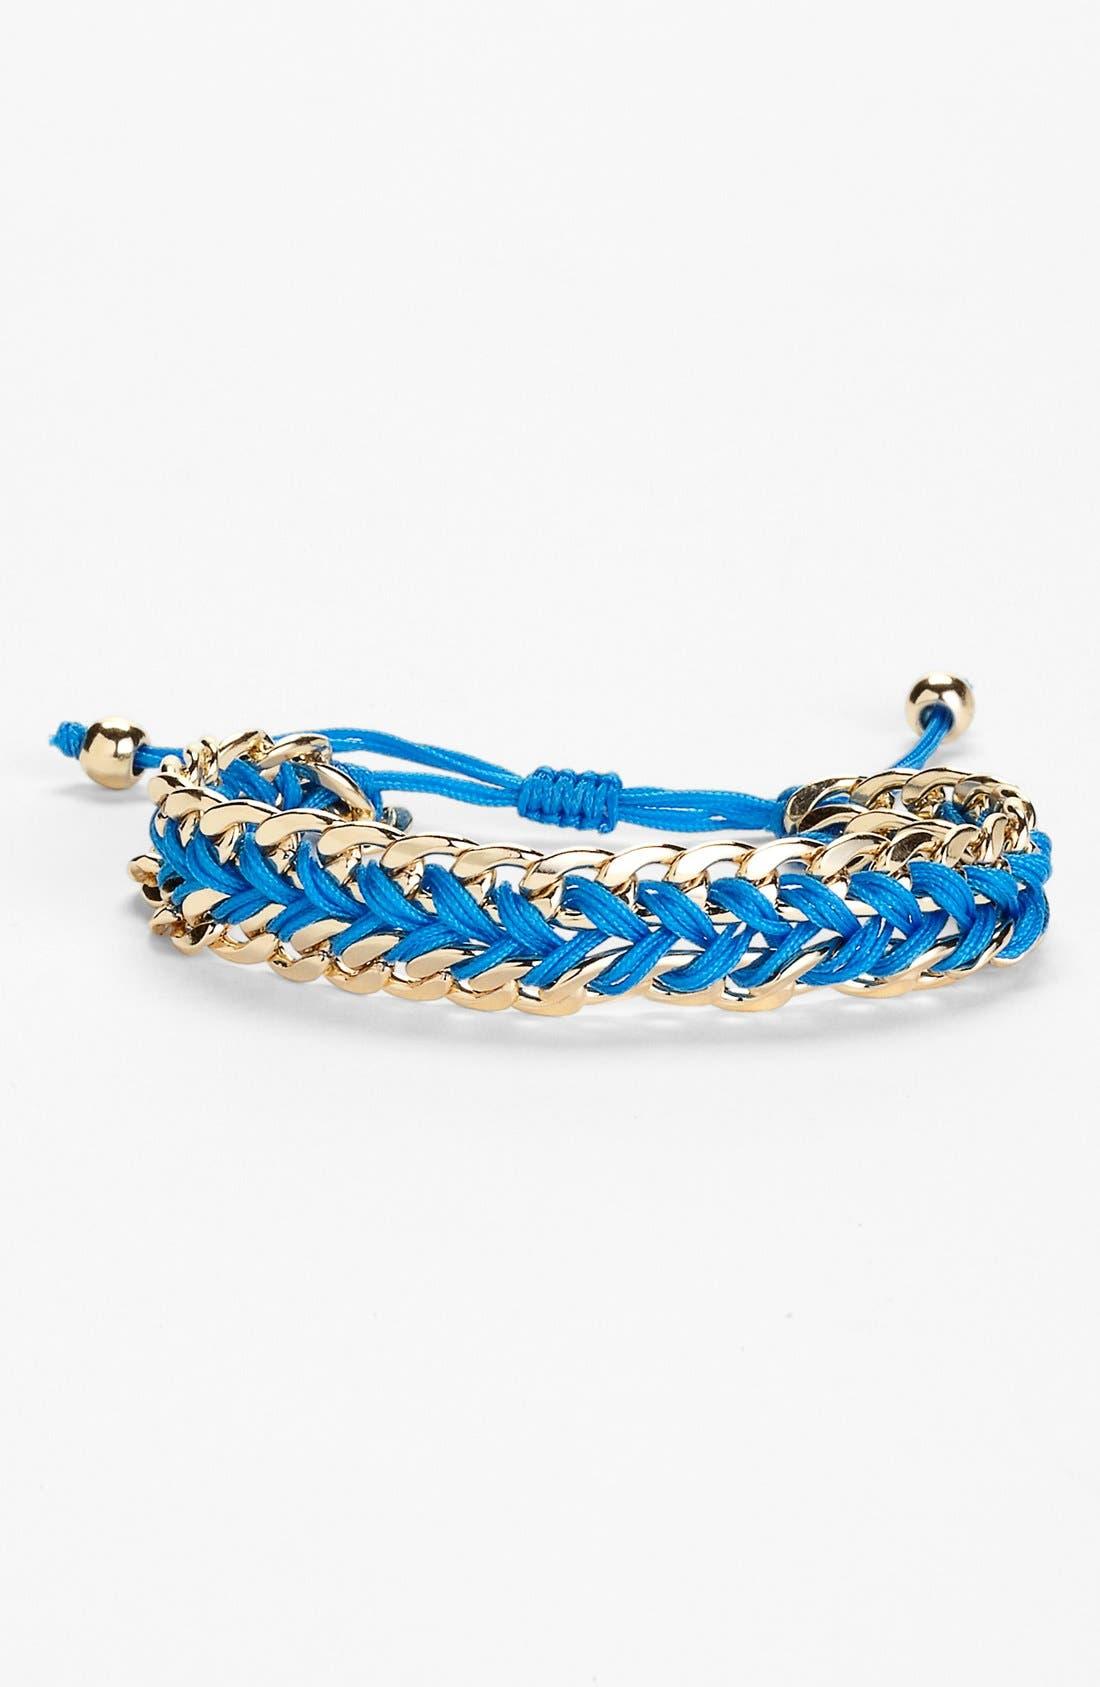 Alternate Image 1 Selected - Tasha Cord & Link Friendship Bracelet